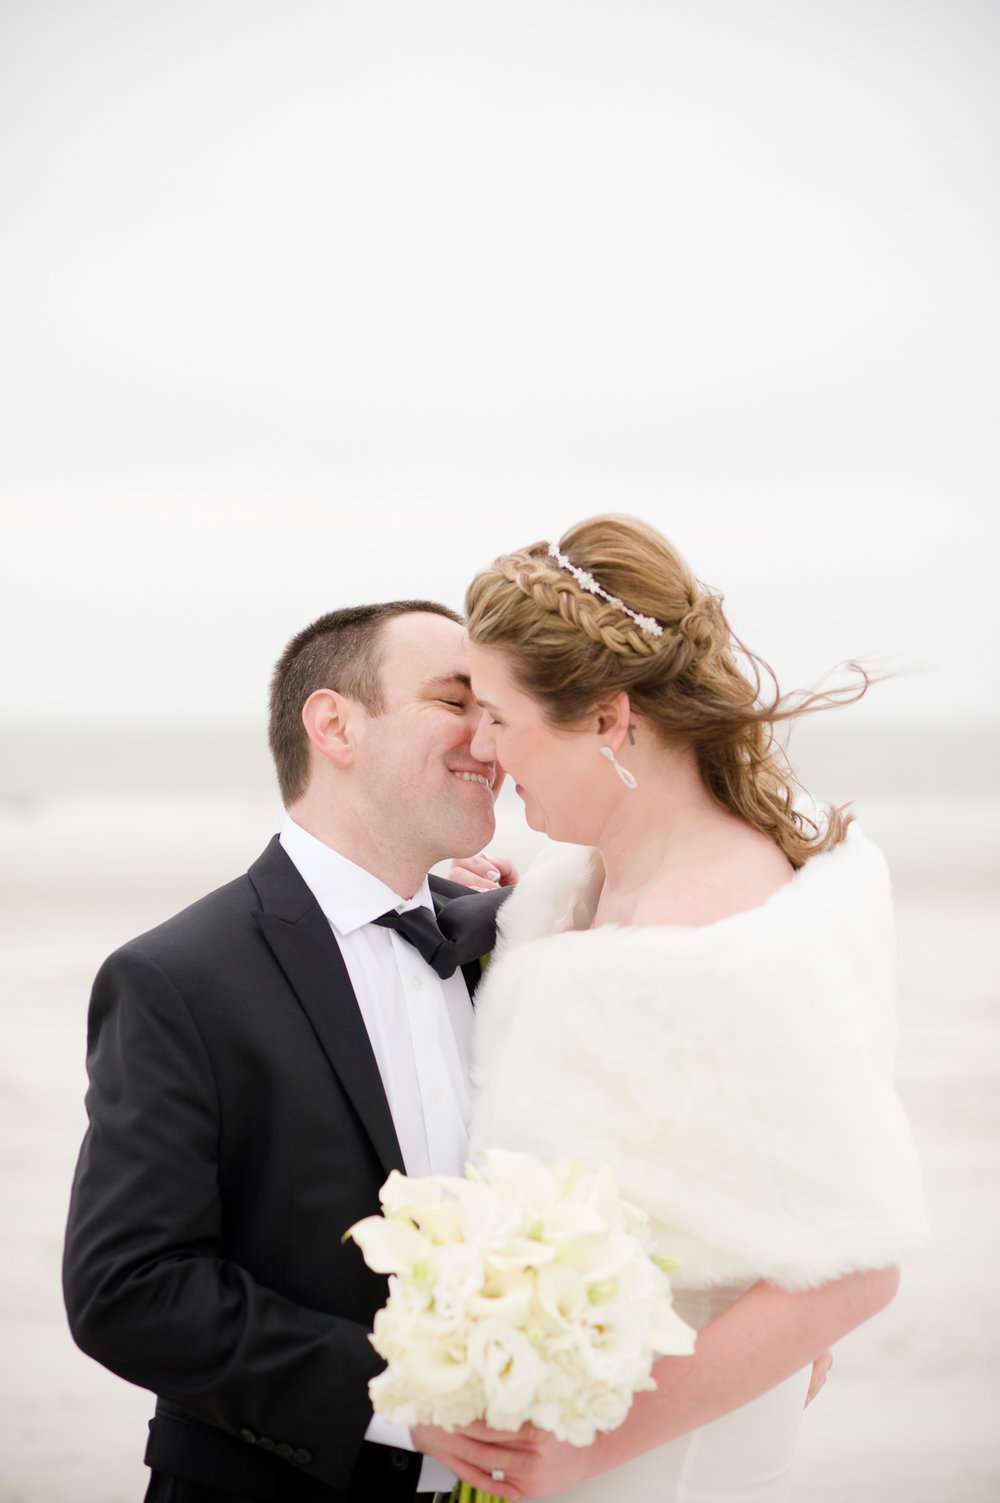 hilton+head+island+elopement-9885.JPG